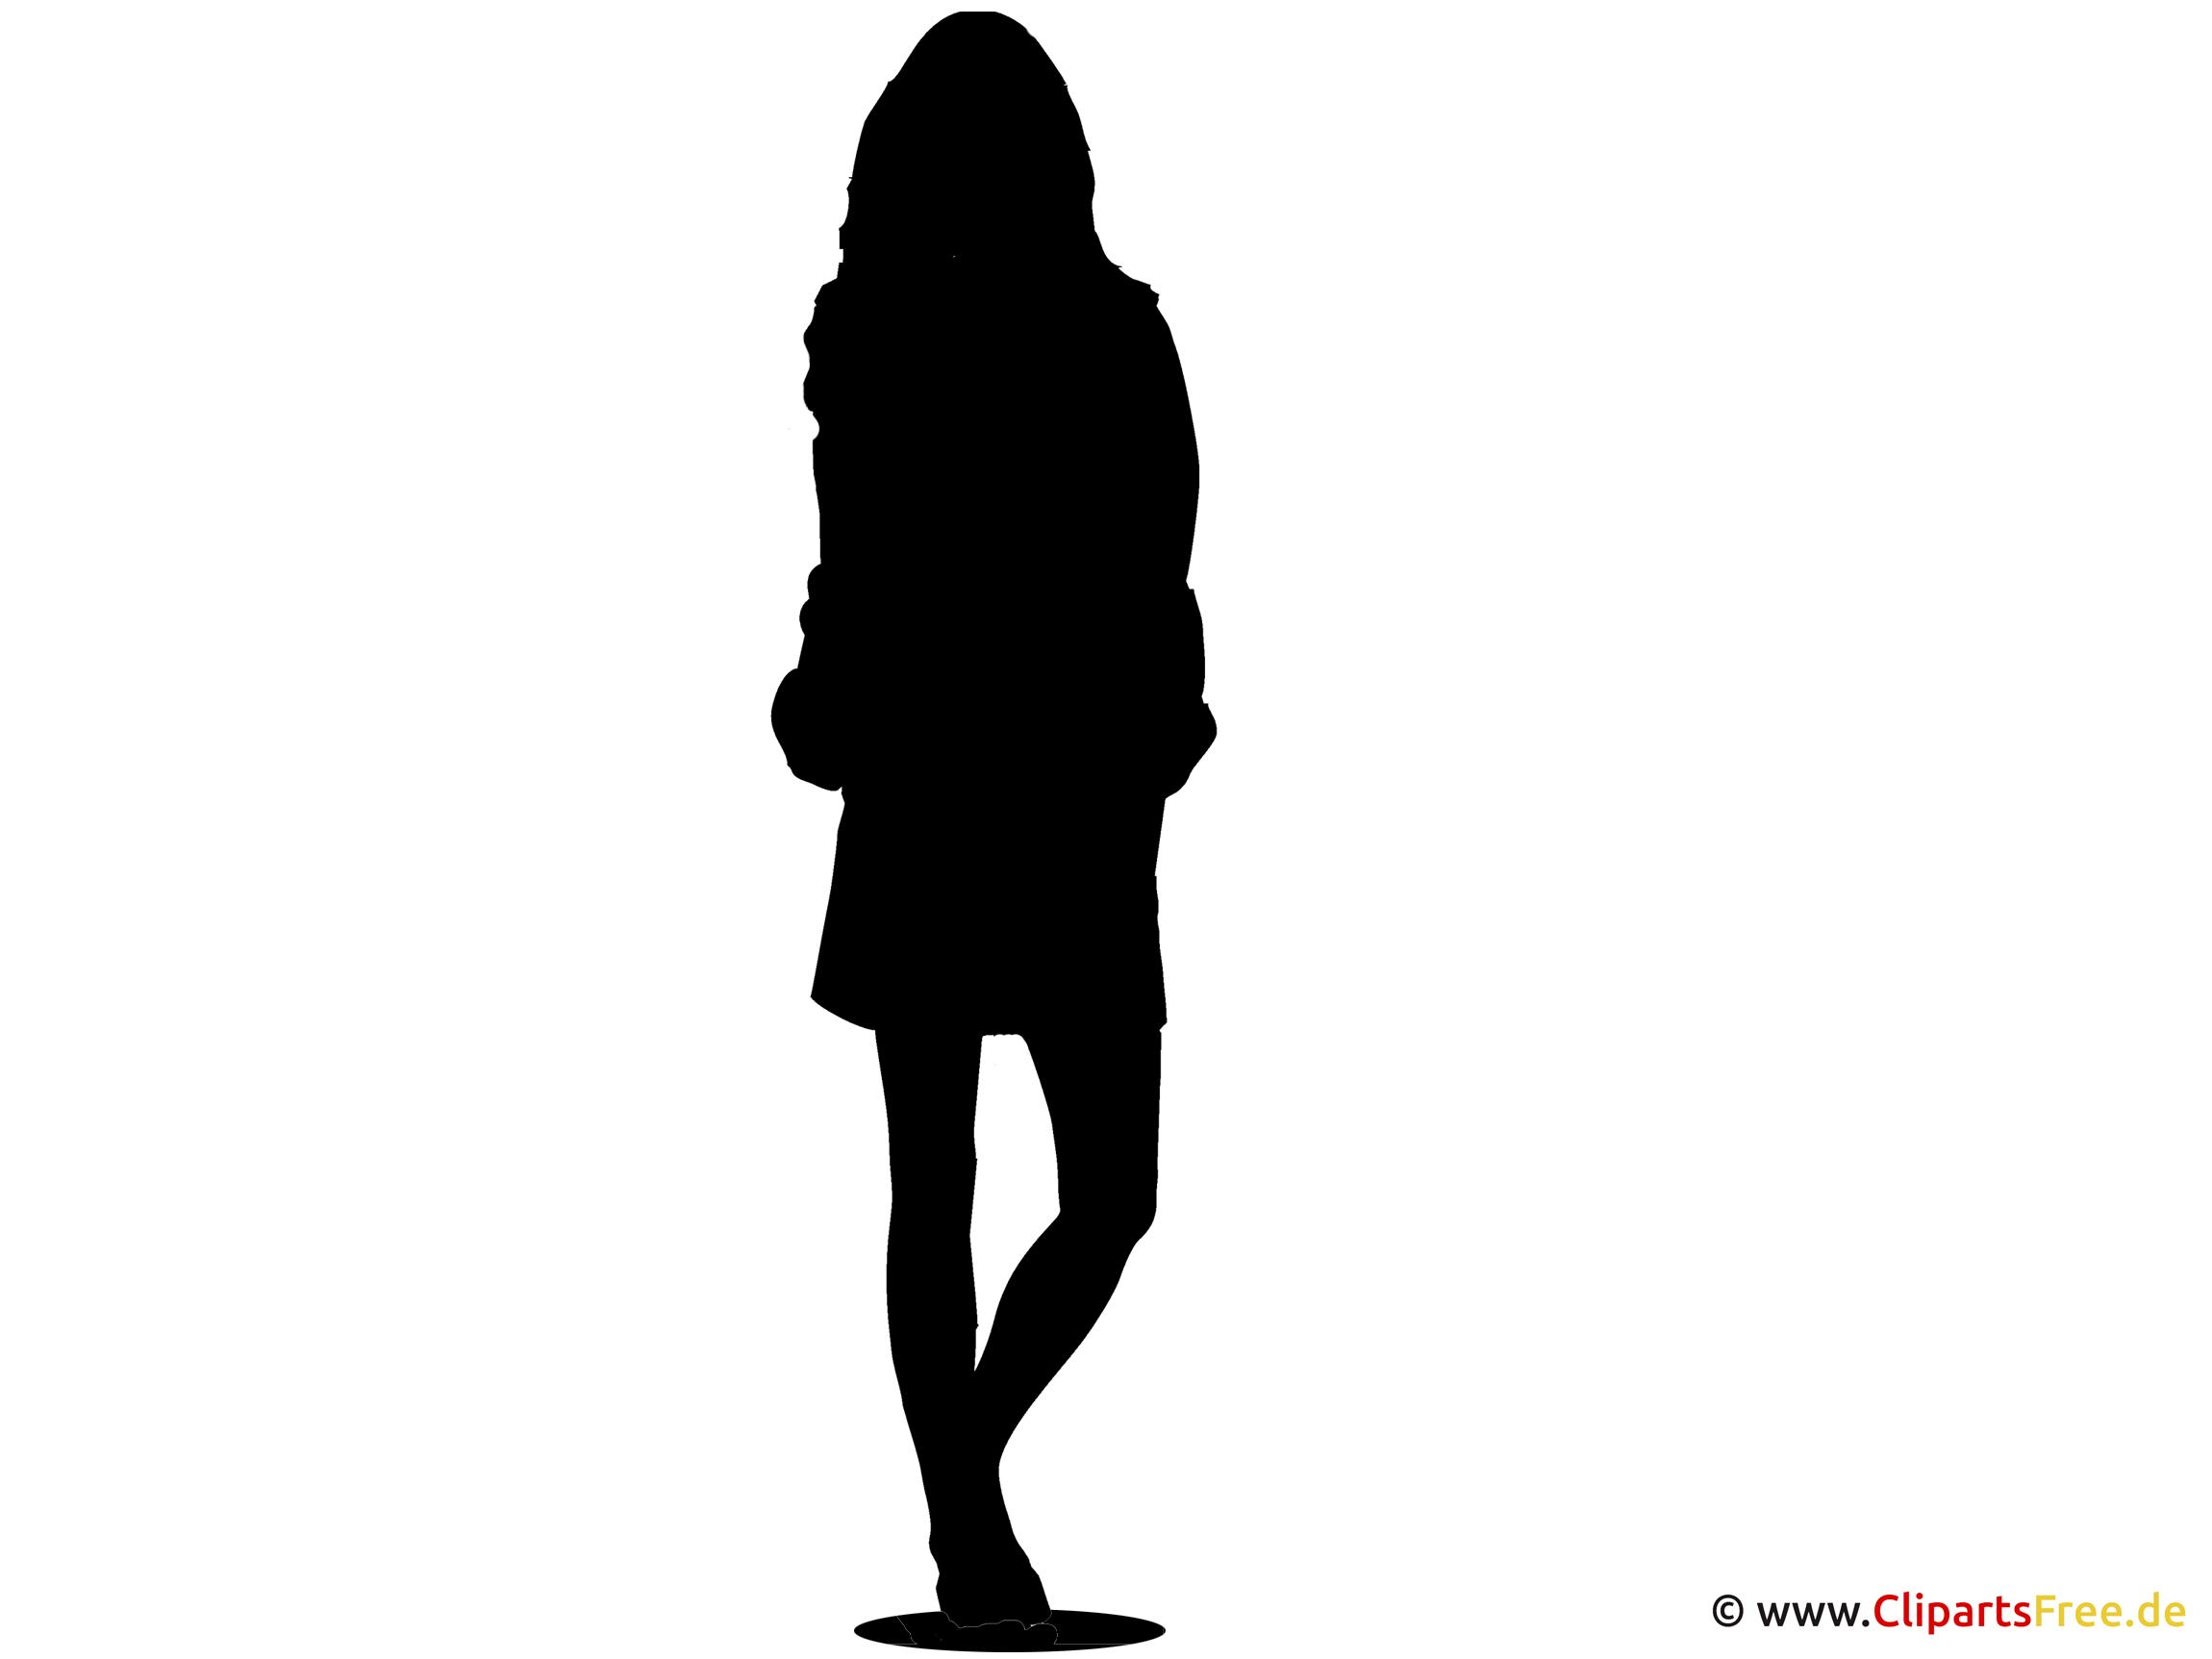 Silhouette Topmodel Clipart